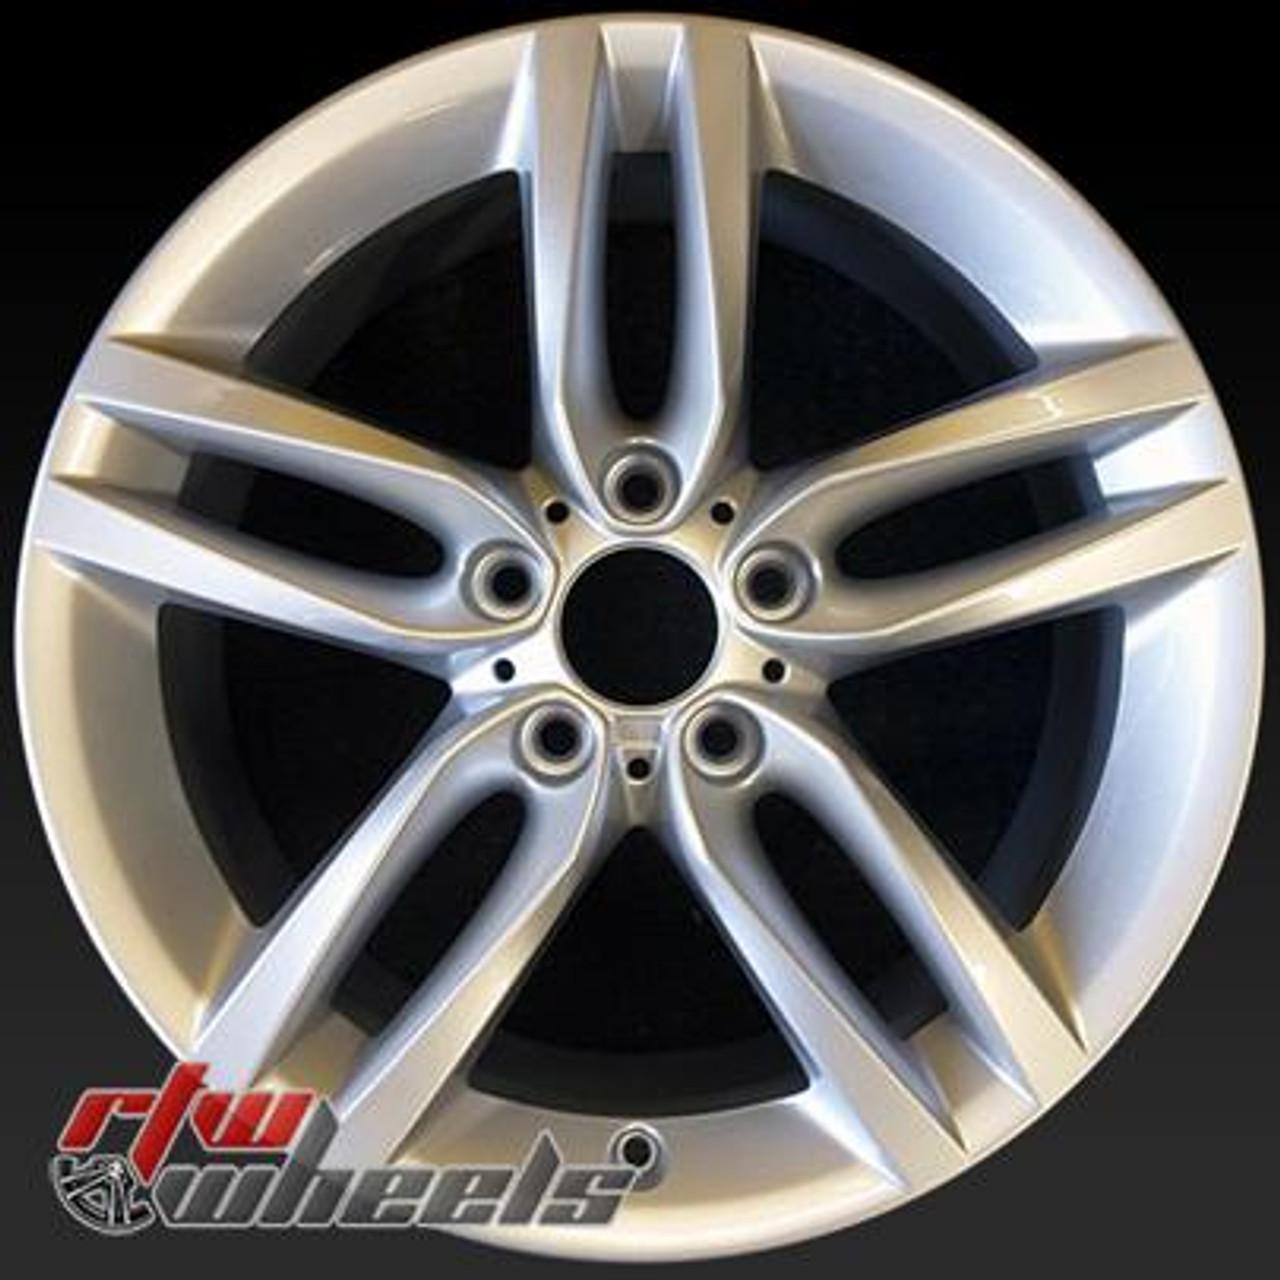 18 Bmw 2 Series Oem Wheels 2014 2017 Silver Alloy Factory Rims 86127